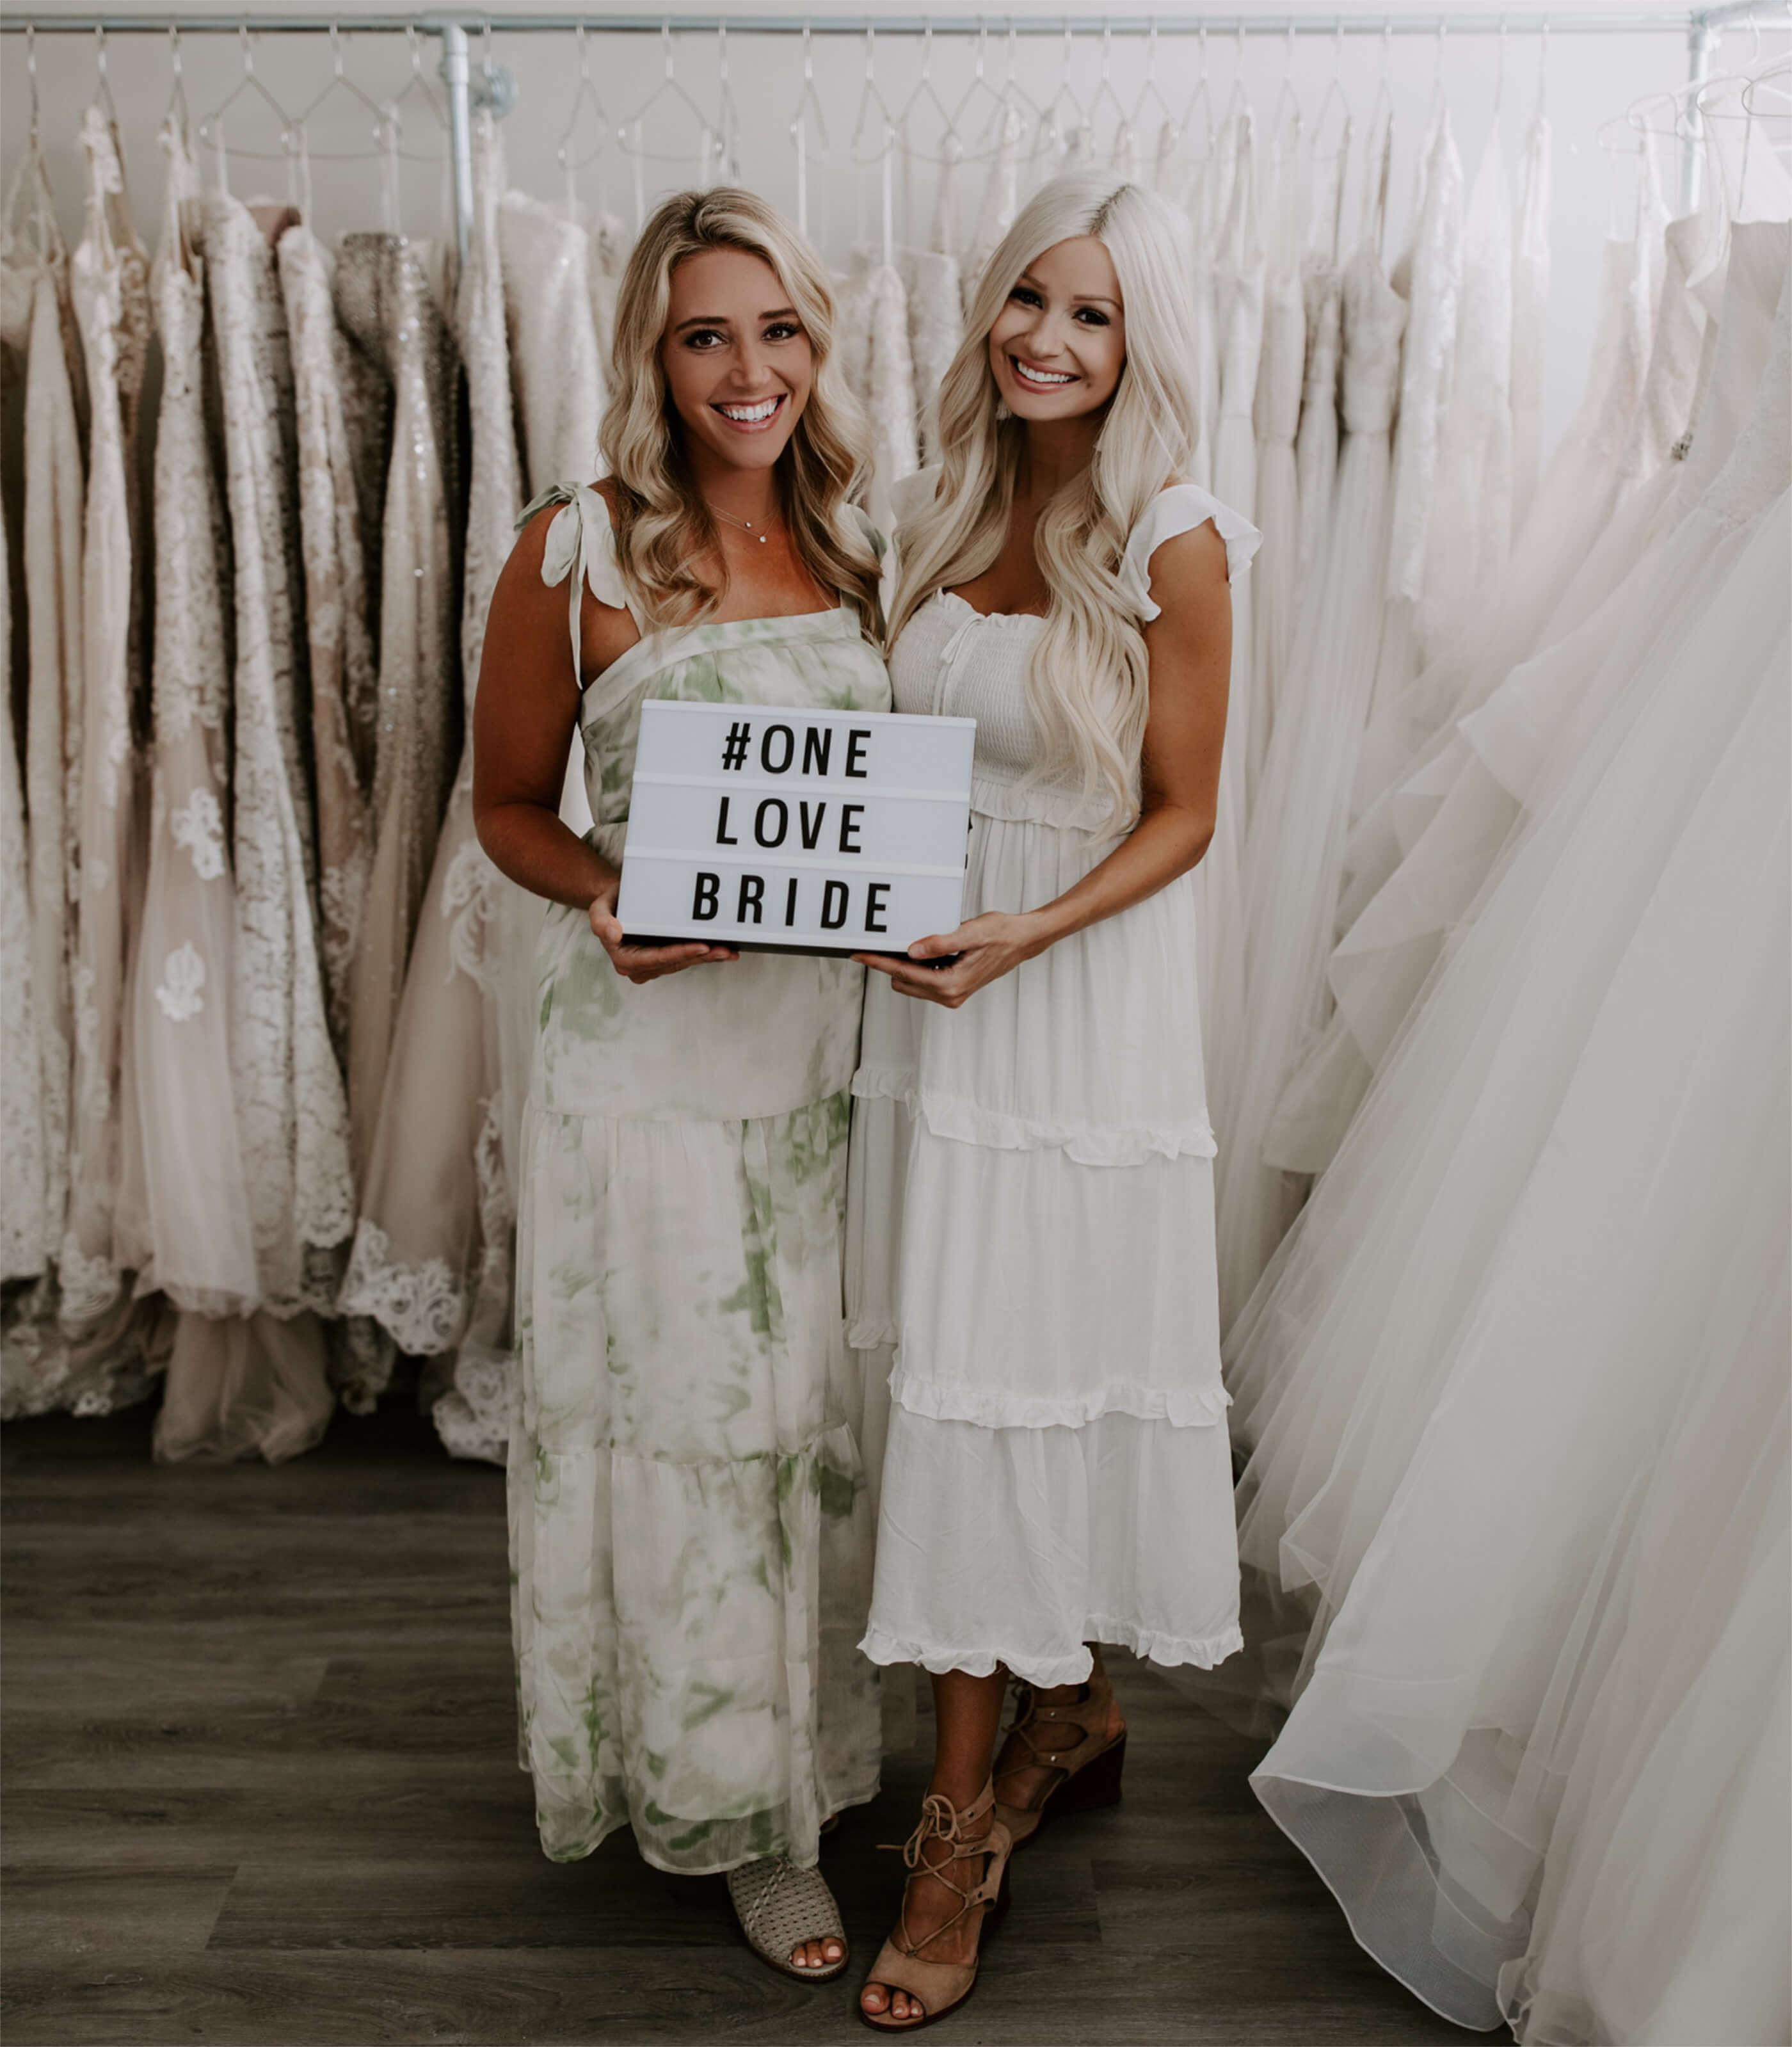 Discount Wedding Dresses Near Me in Jacksonville, FL